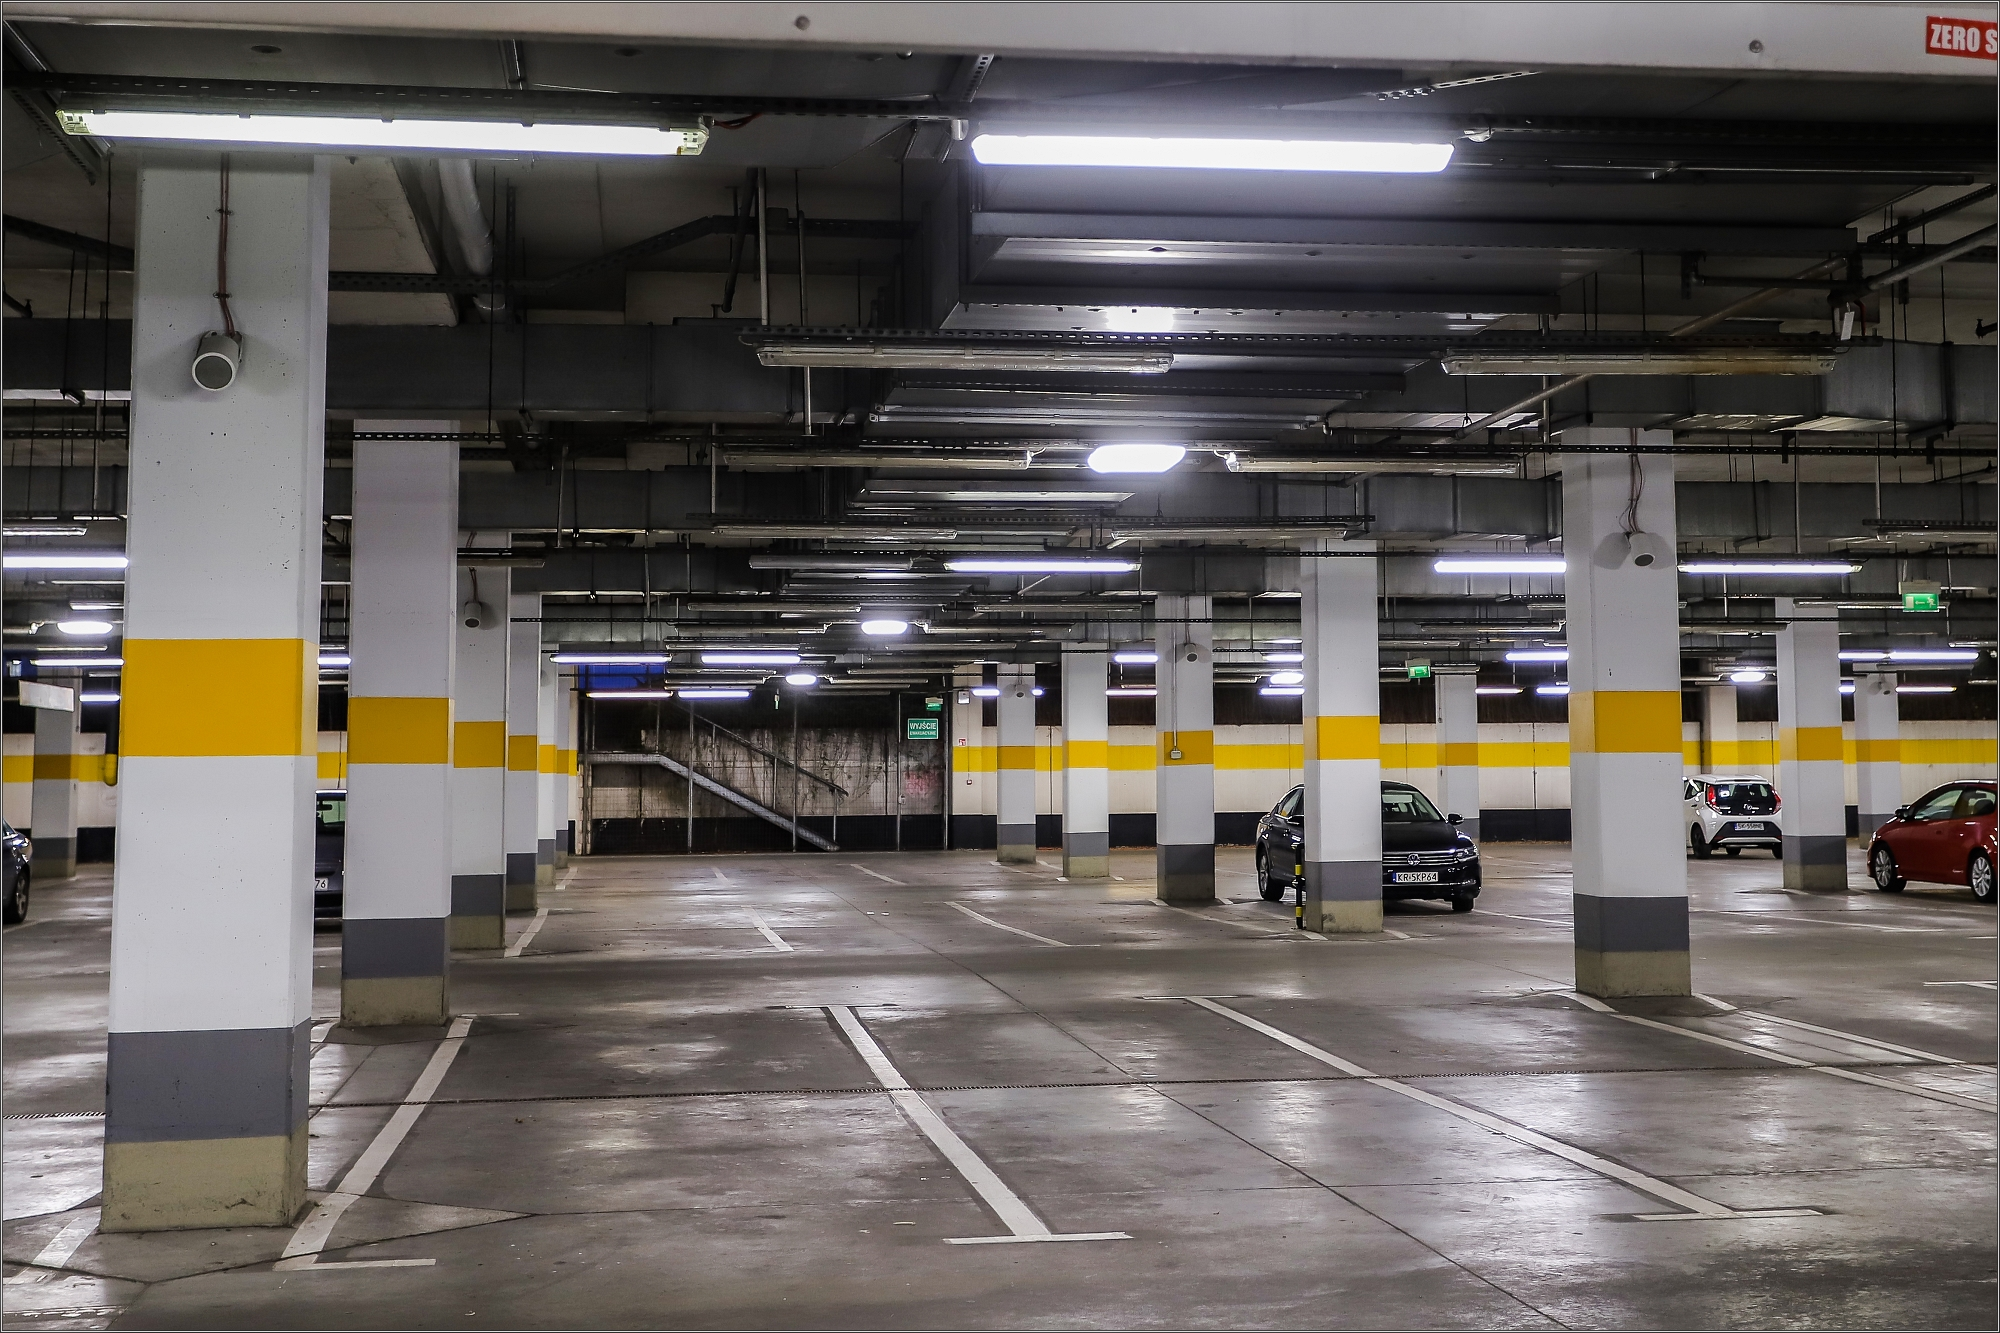 Oprawy LED od Beghelli na parkingu w galerii Silesia City Center fot. Beghelli.jpg